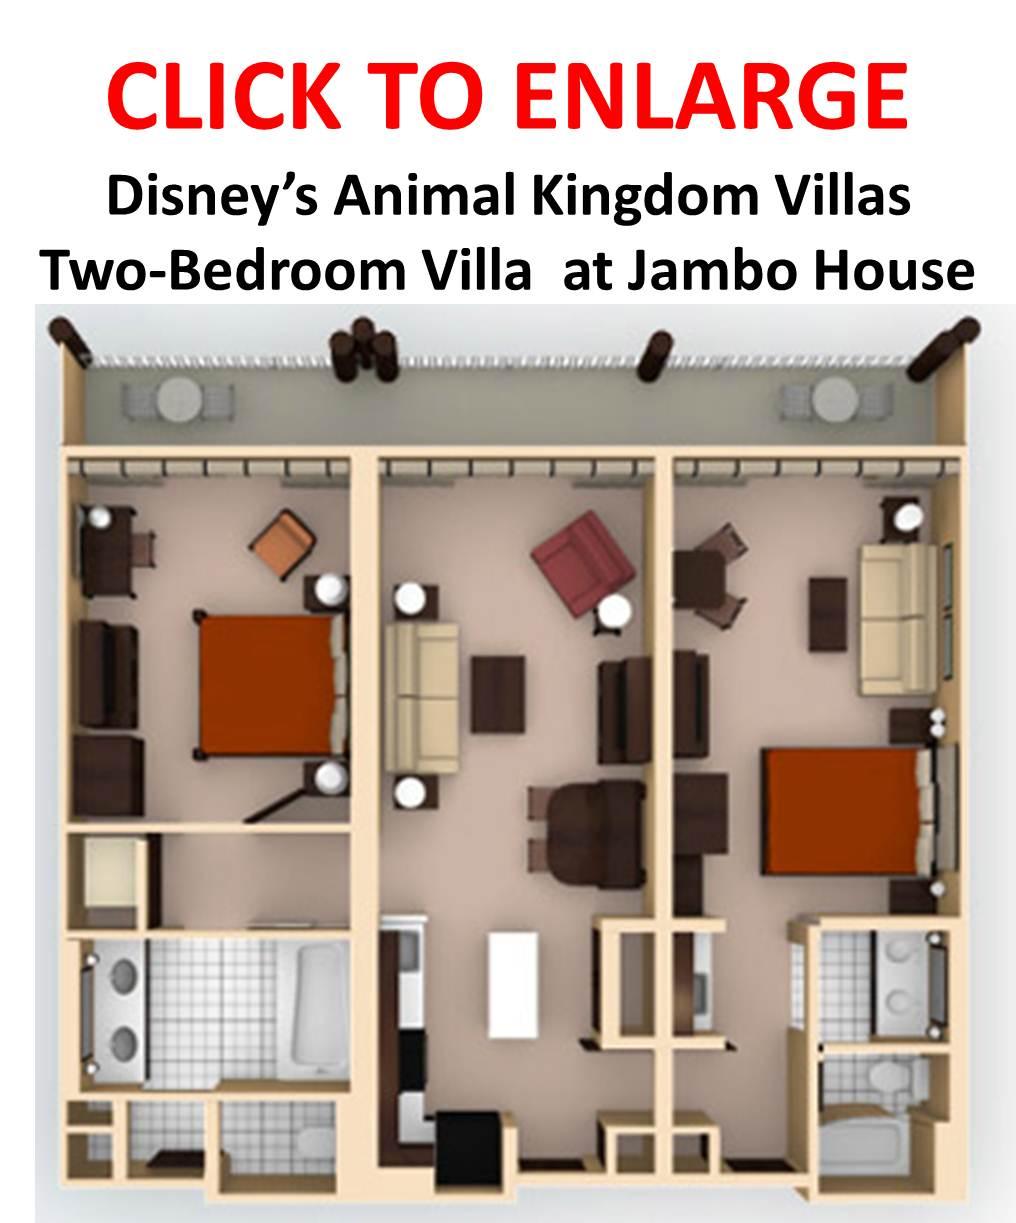 AKL DVC Value 8 bedroom Villa  WDWMAGIC - Unofficial Walt Disney